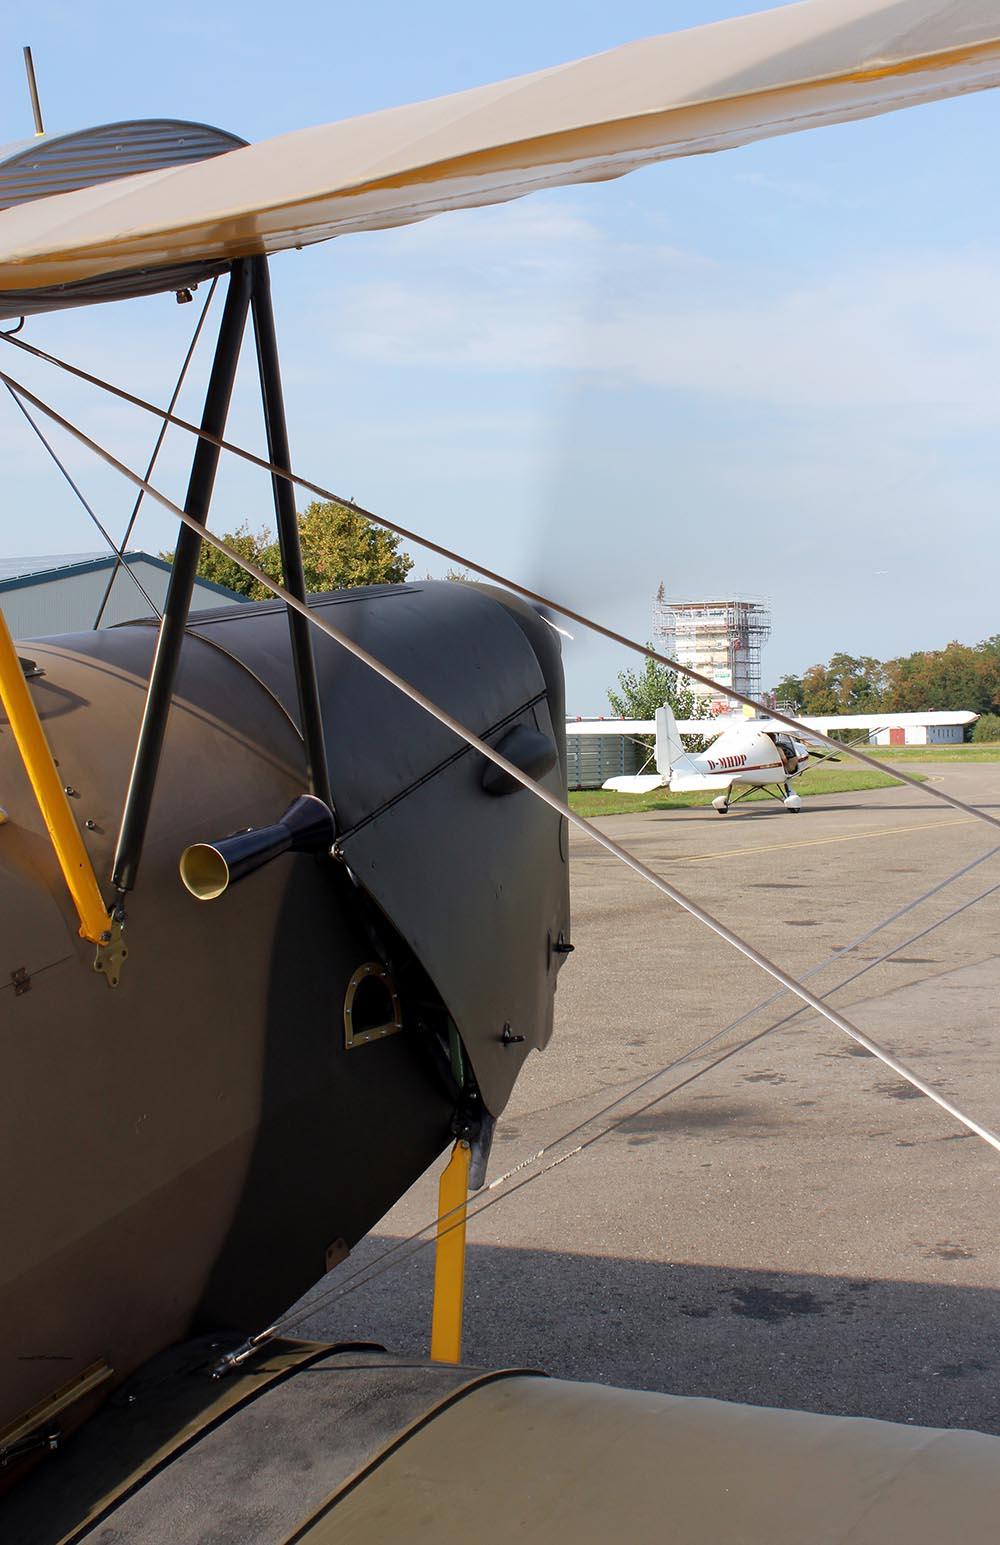 De_Havilland_TigerMoth_D-ECTM_2011-08-2525.jpg